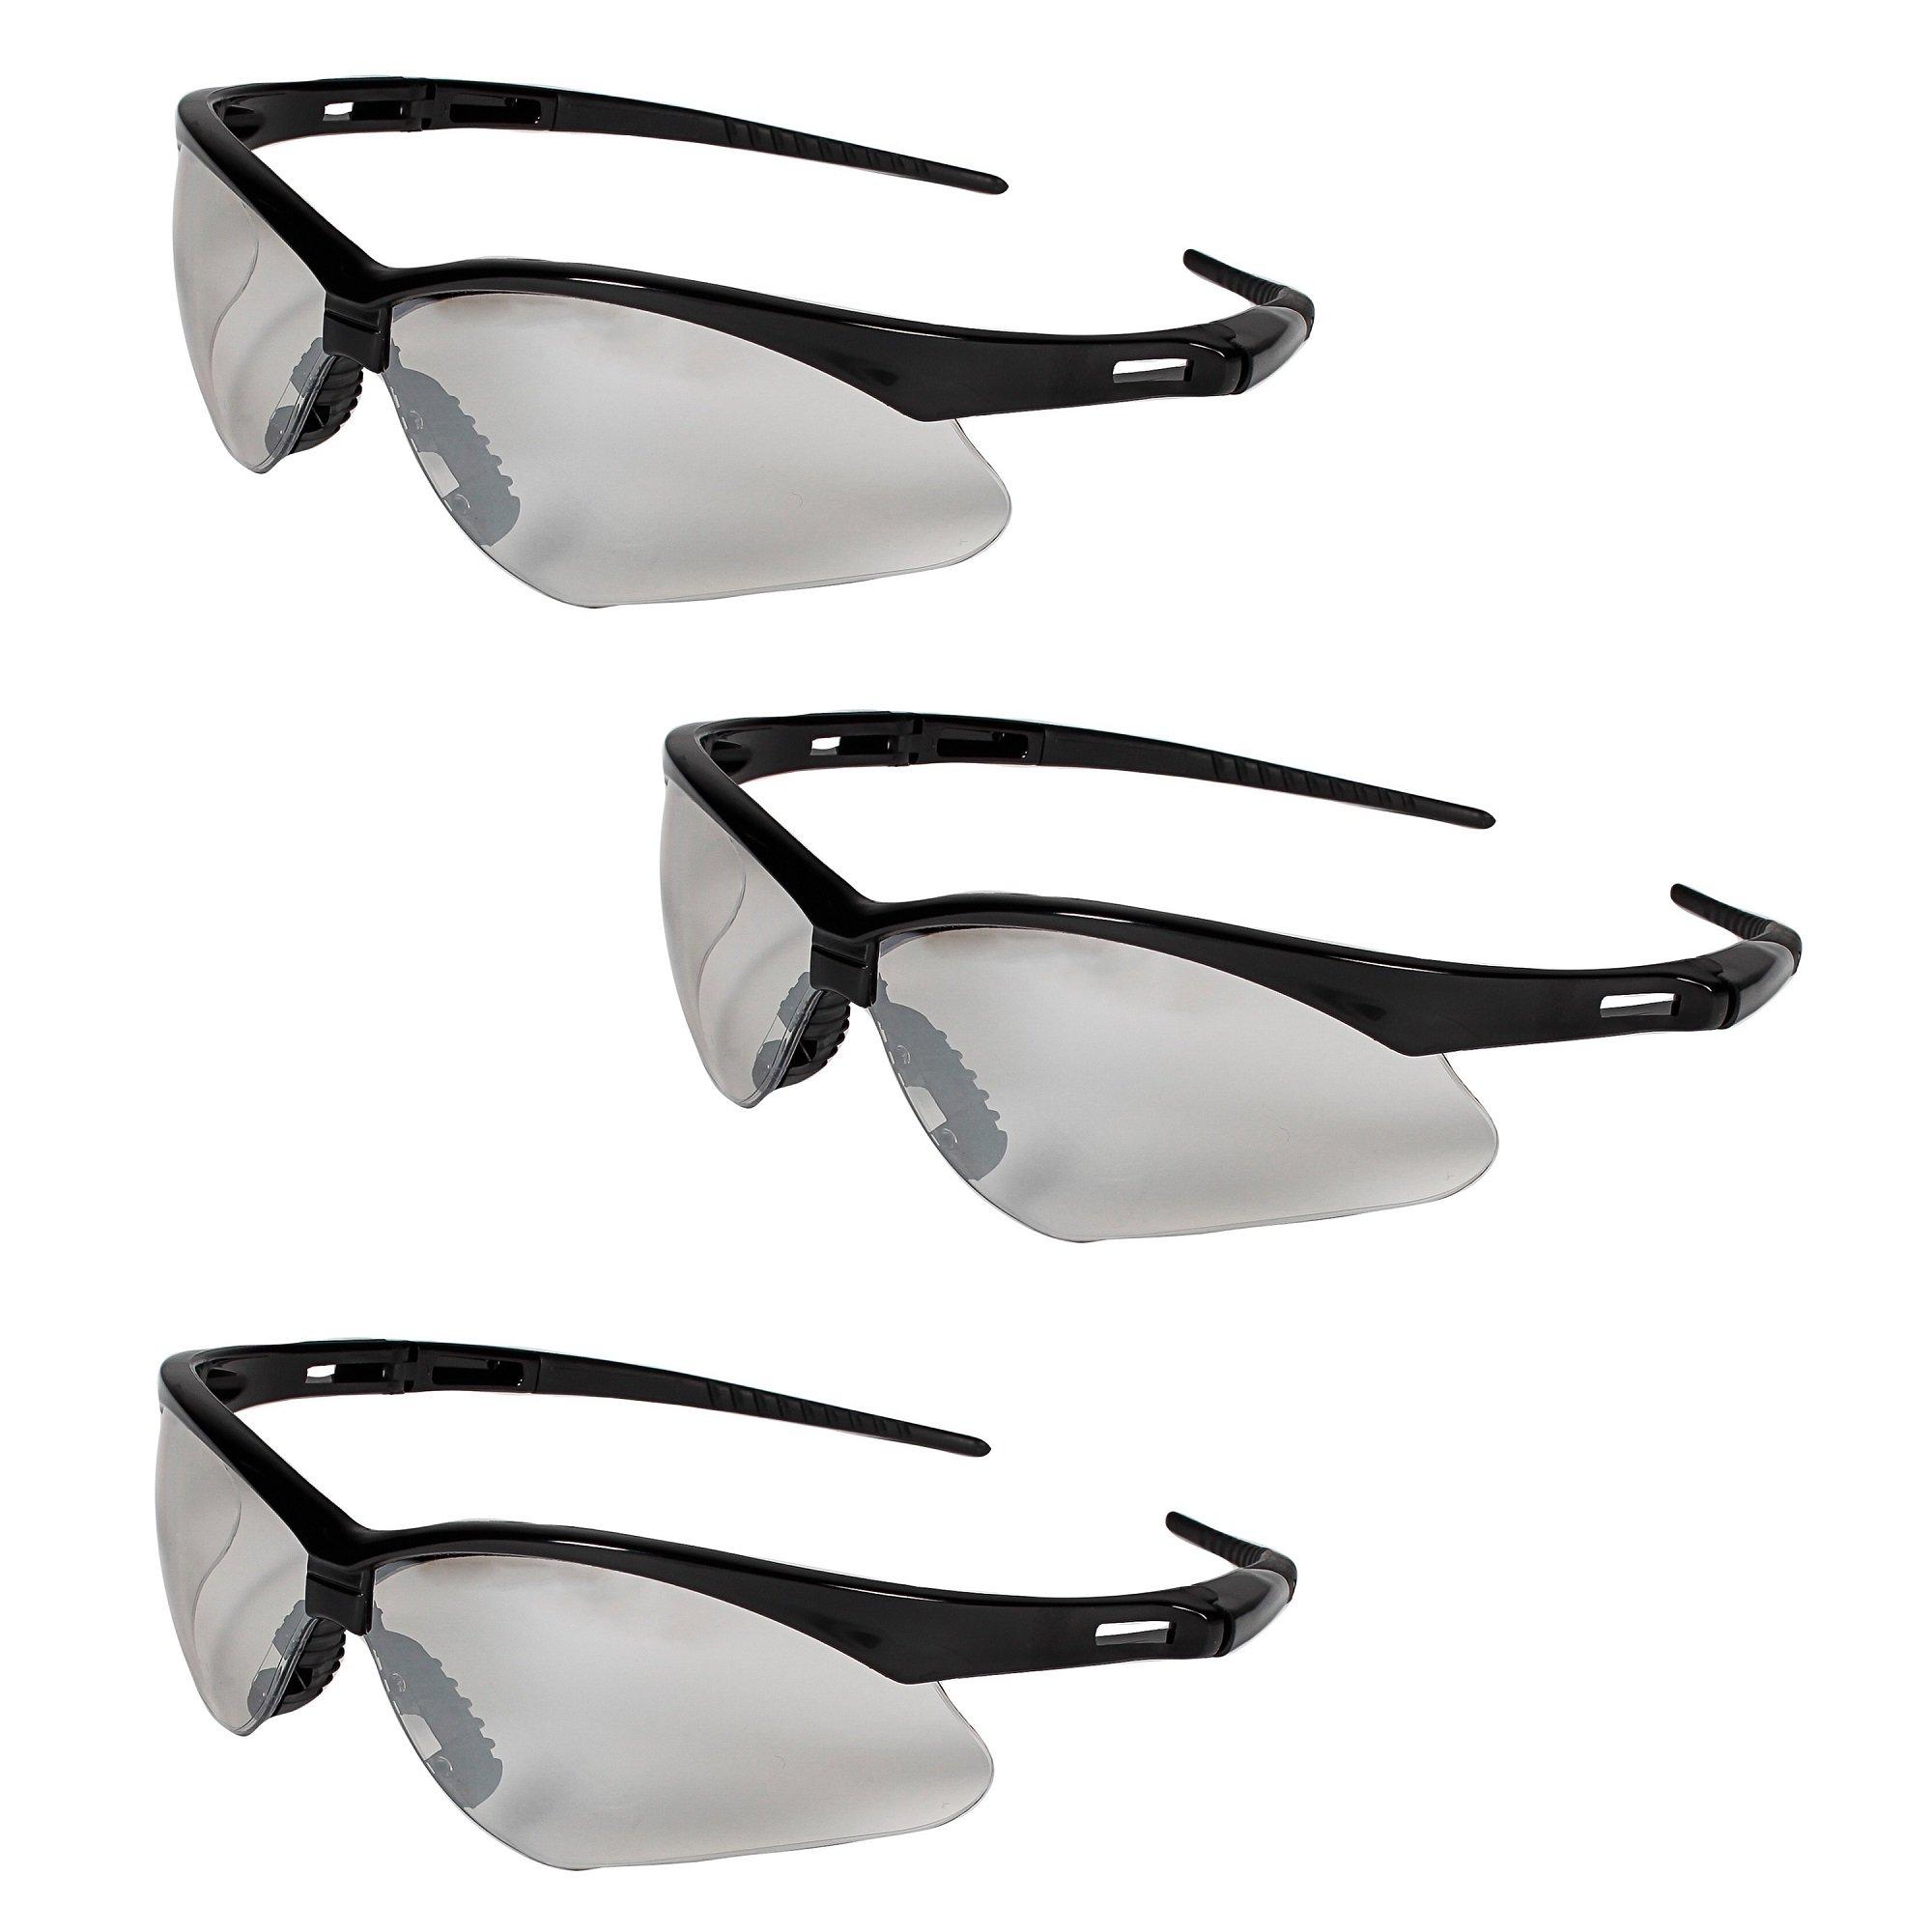 Jackson Safety V30 25685 Nemesis Safety Glasses 3000357 (3 Pair) (Black Frame with Indoor/Outdoor Lens)